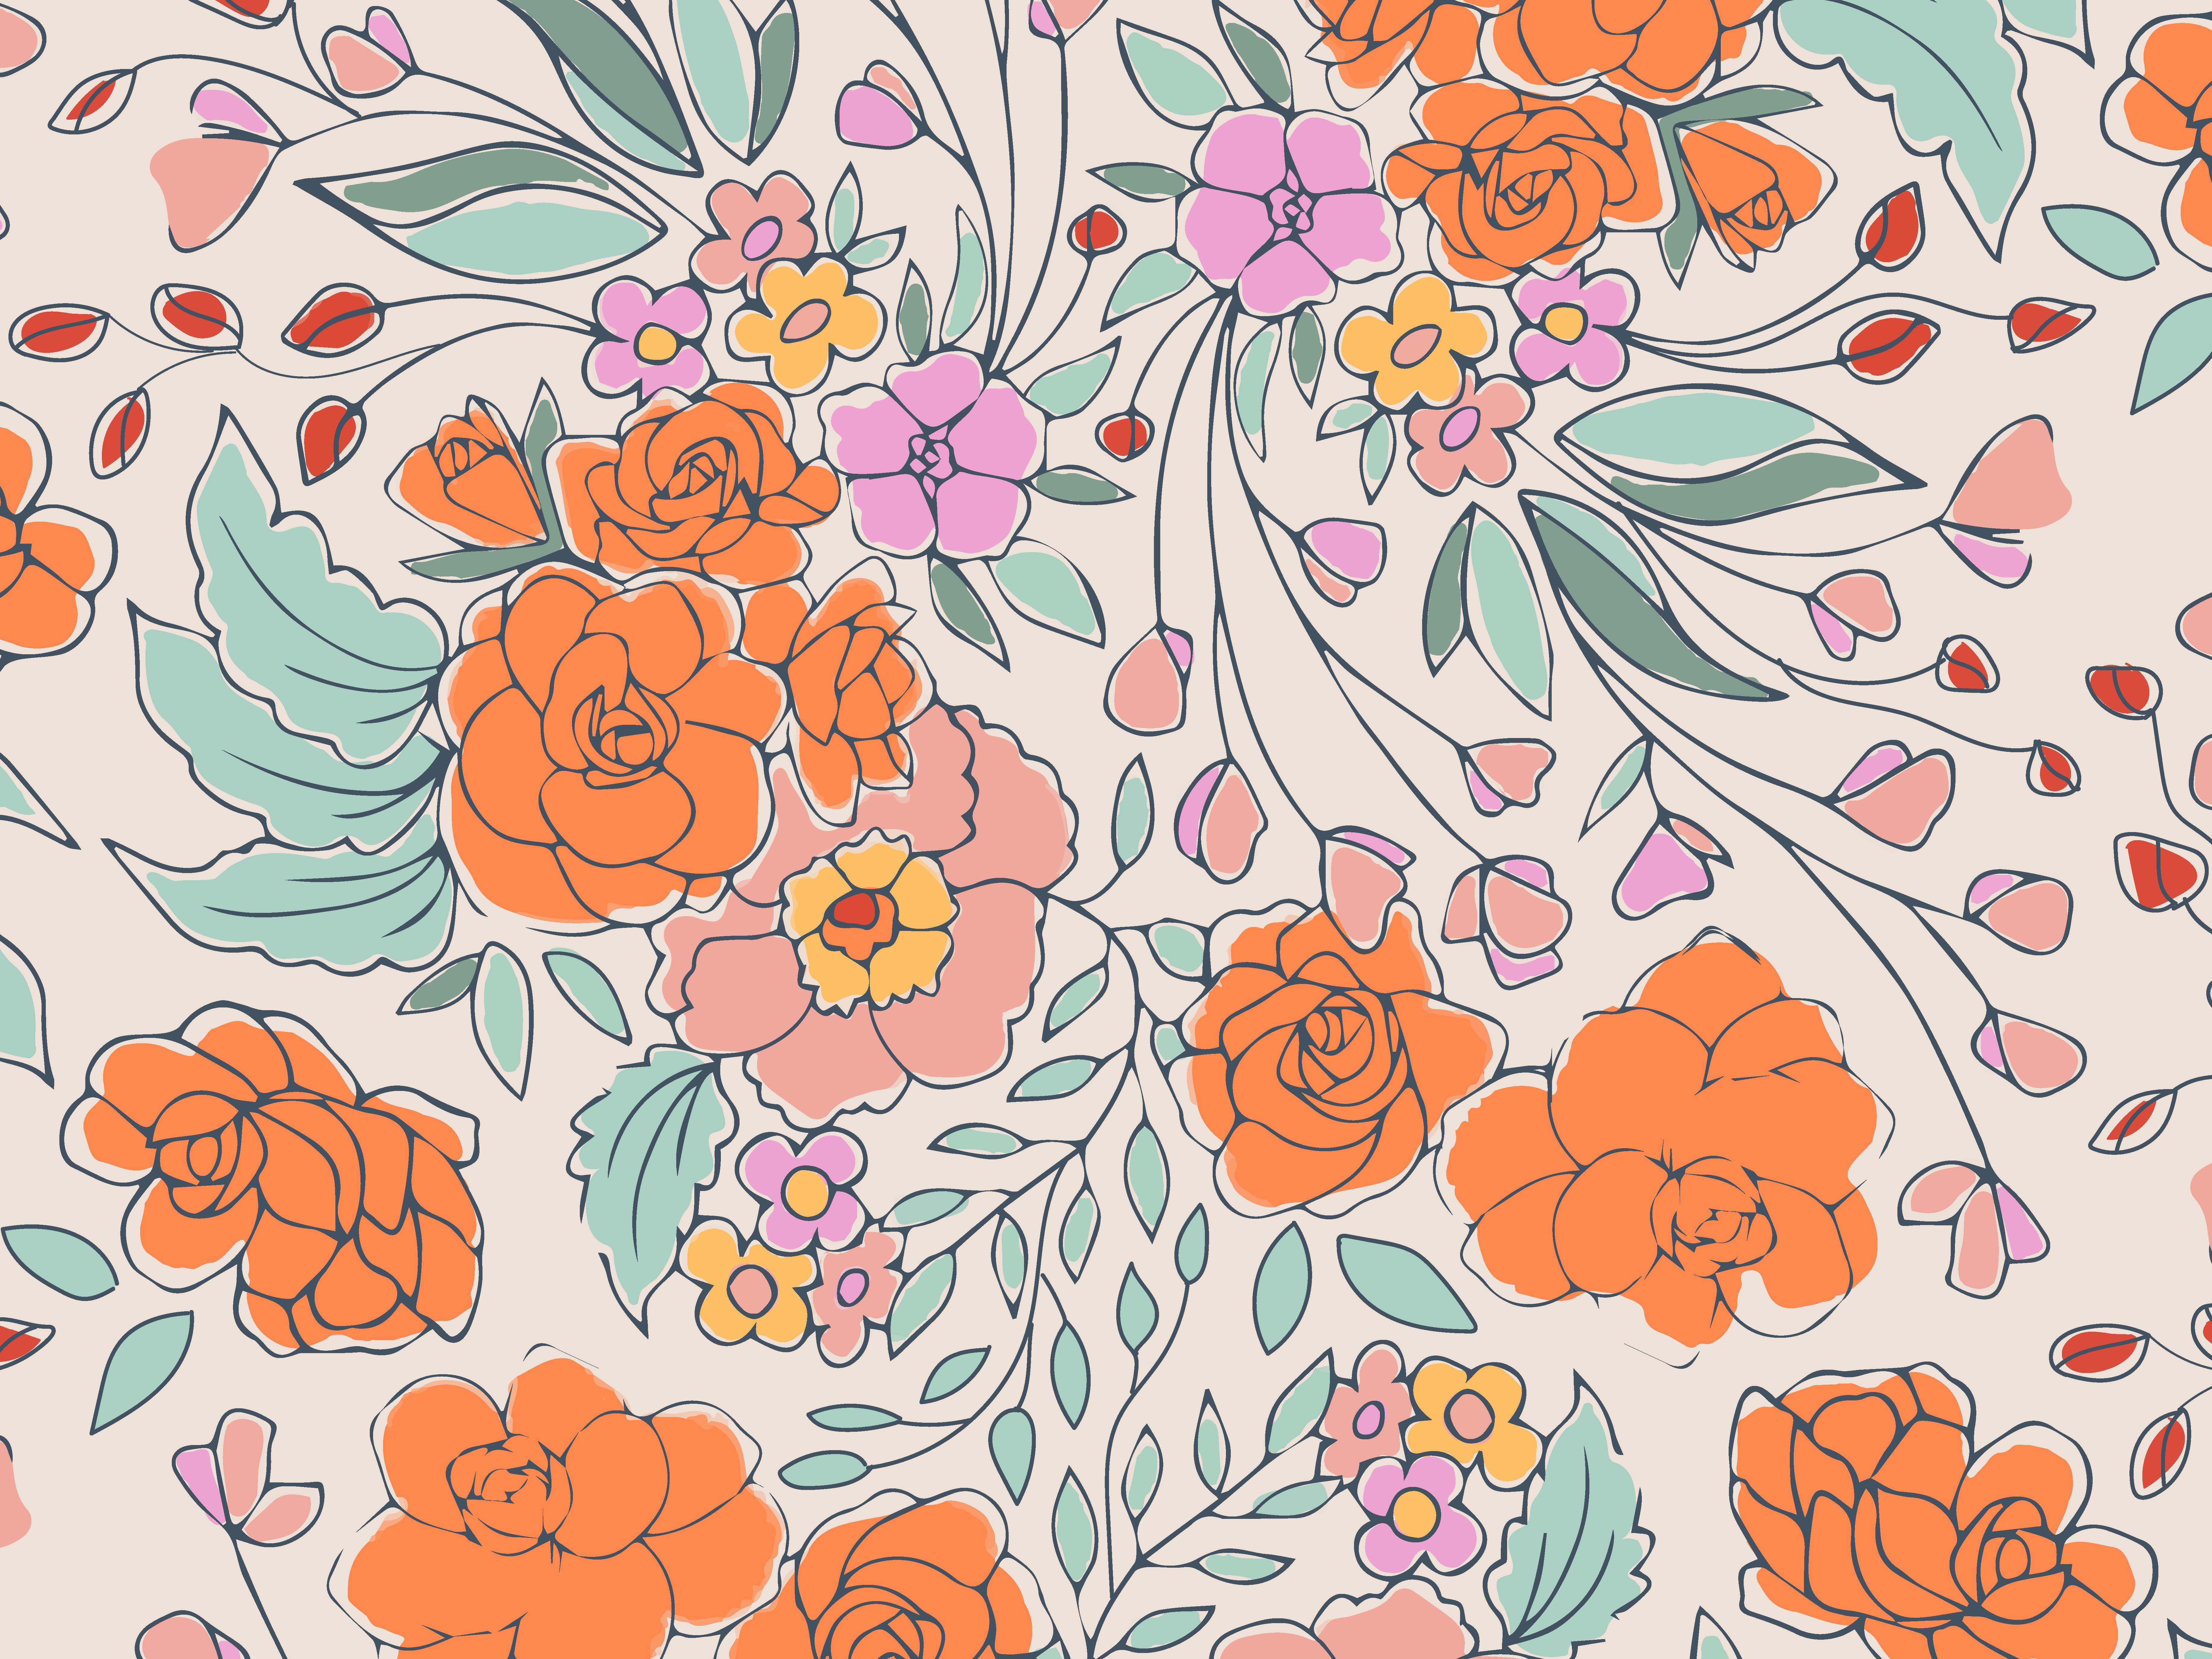 Begonias repeat pattern by Melanie Hodge on Dribbble